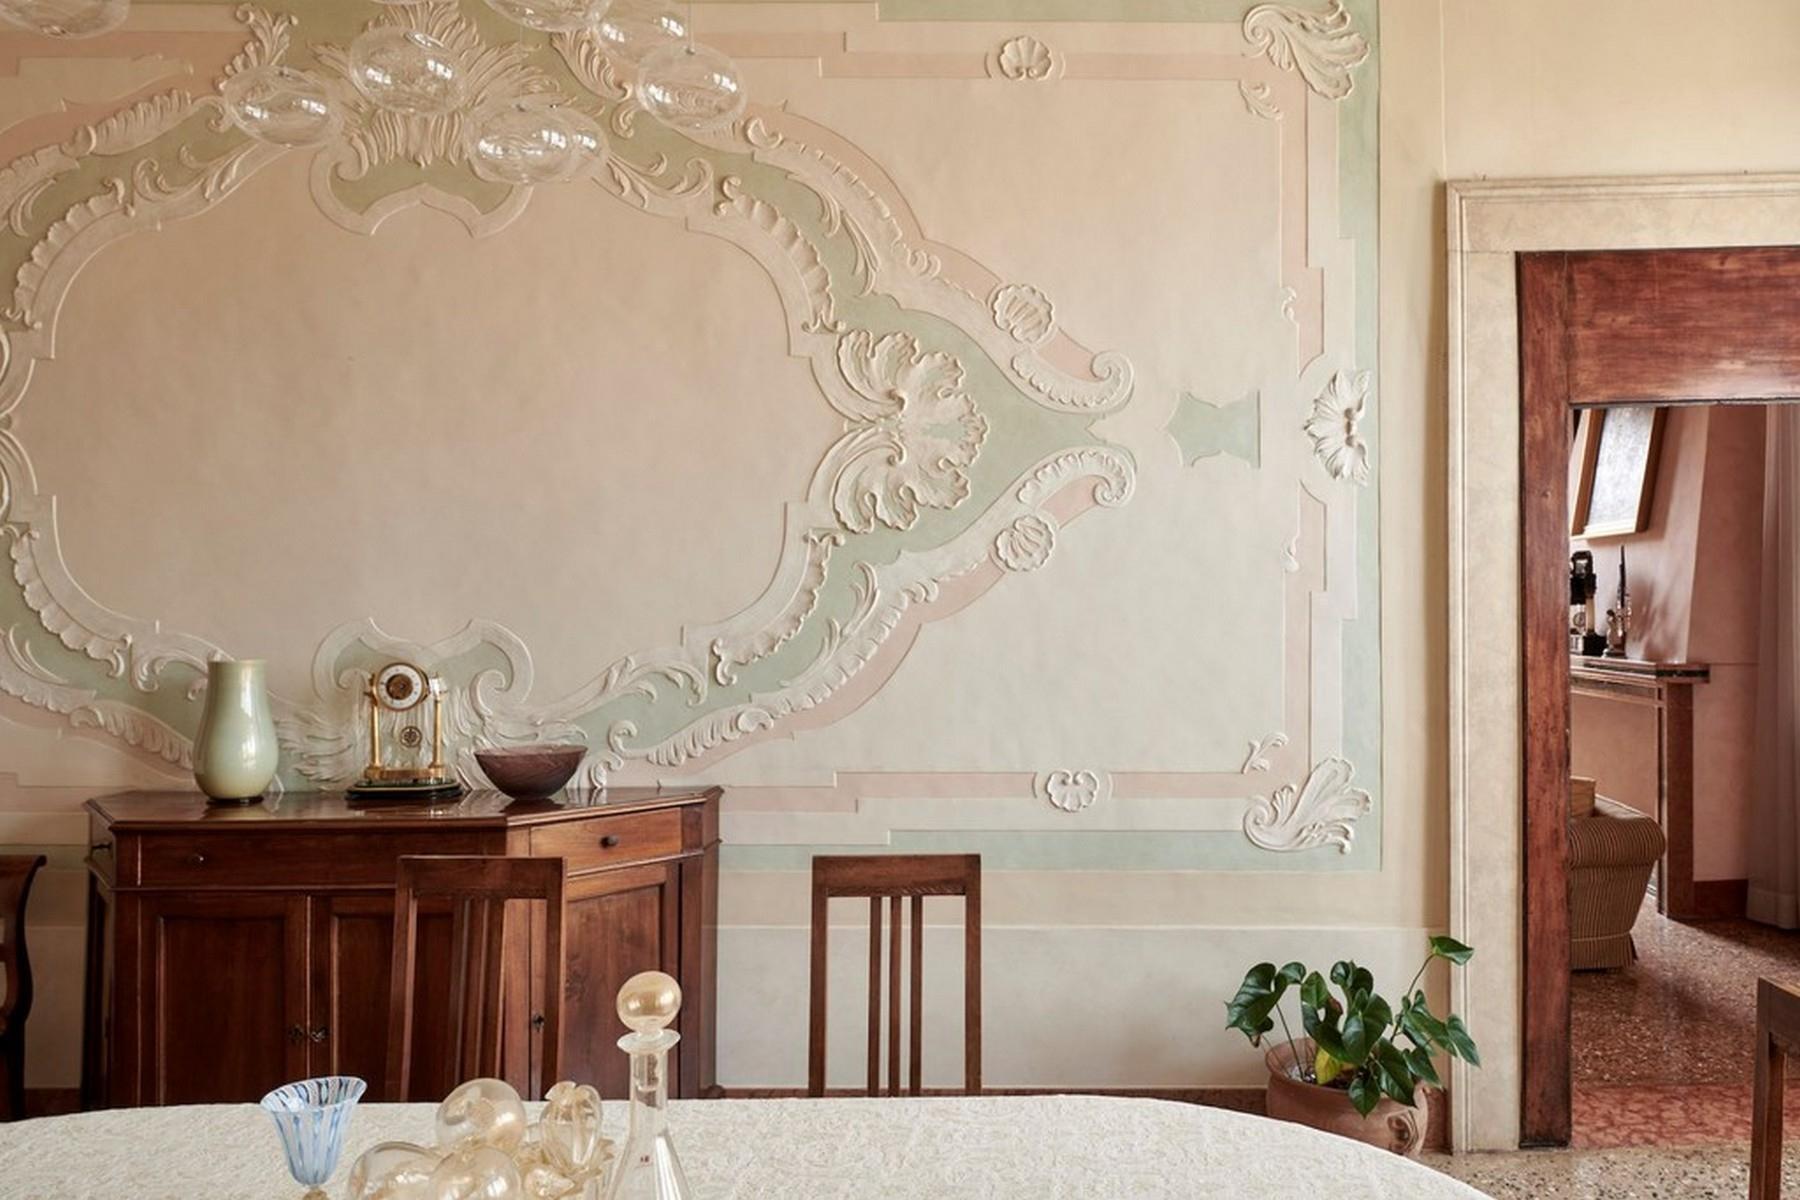 Elegante secondo Piano Nobile in un Palazzo - 8